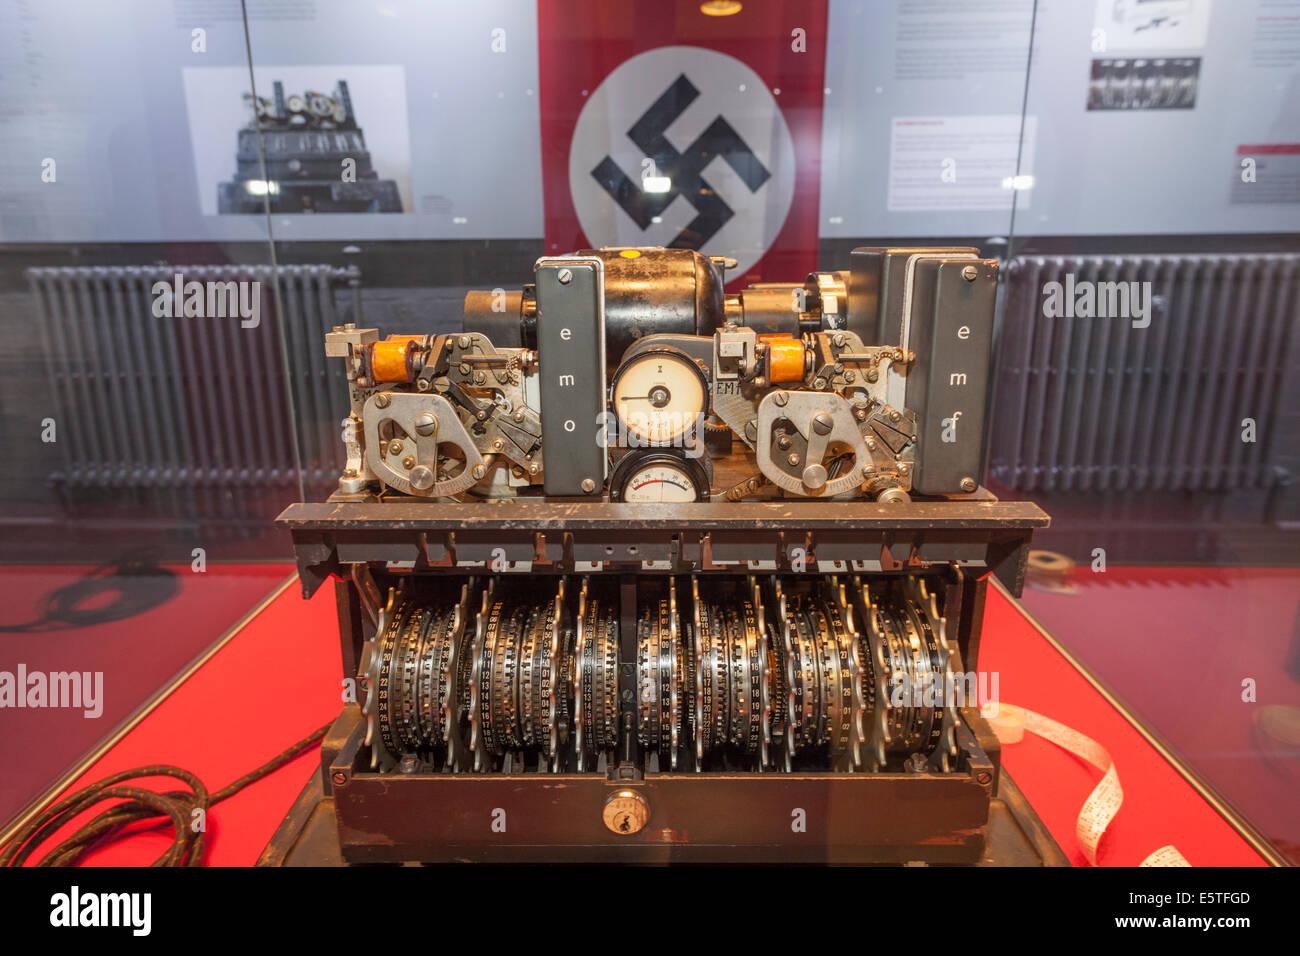 England, Buckinghamshire, Bletchley, Bletchley Park, WWII German Lorenz Cipher Machine Stock Photo